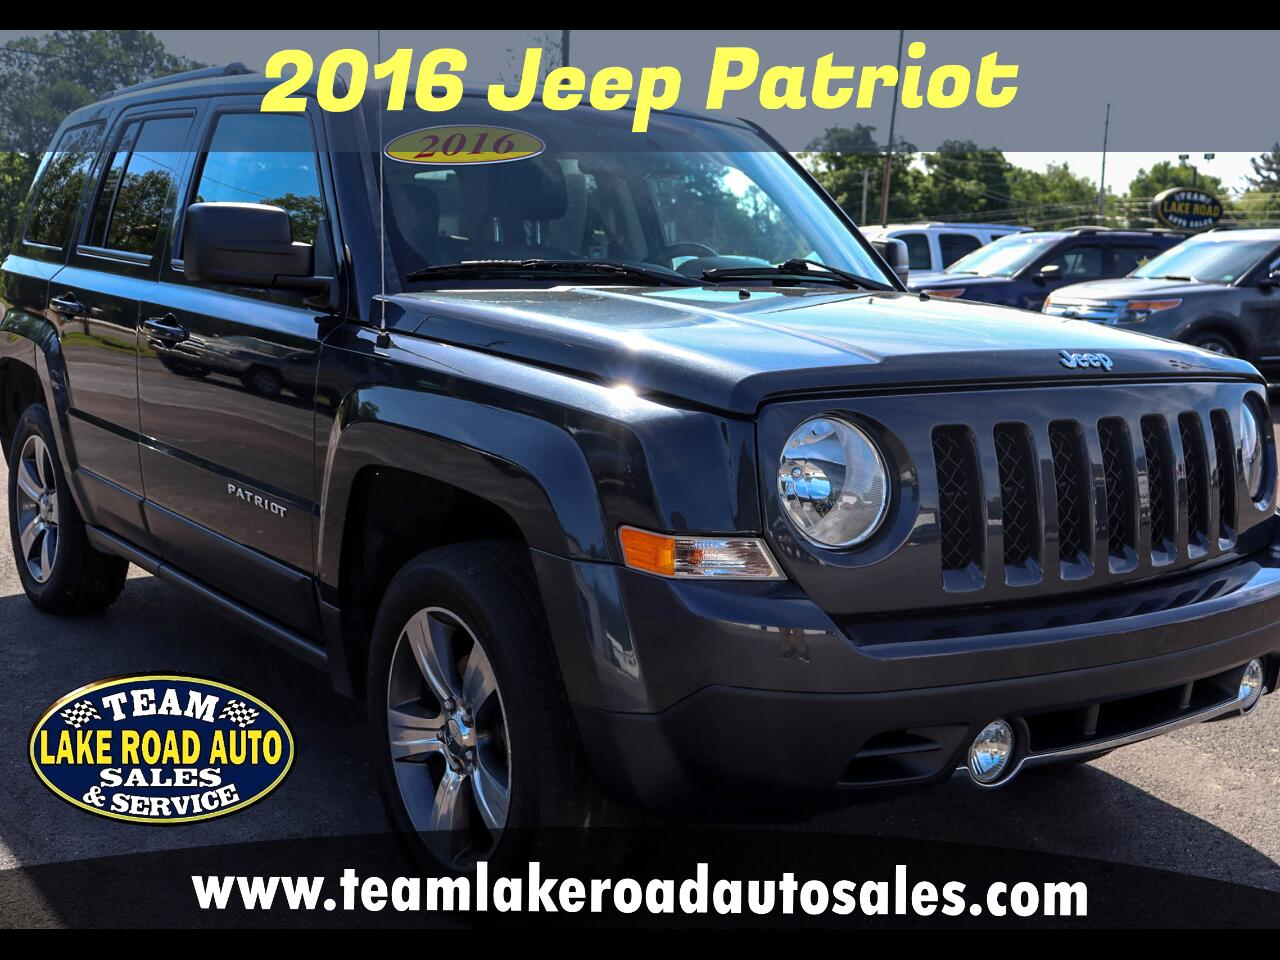 Jeep Patriot 4WD 4dr High Altitude Edition 2016